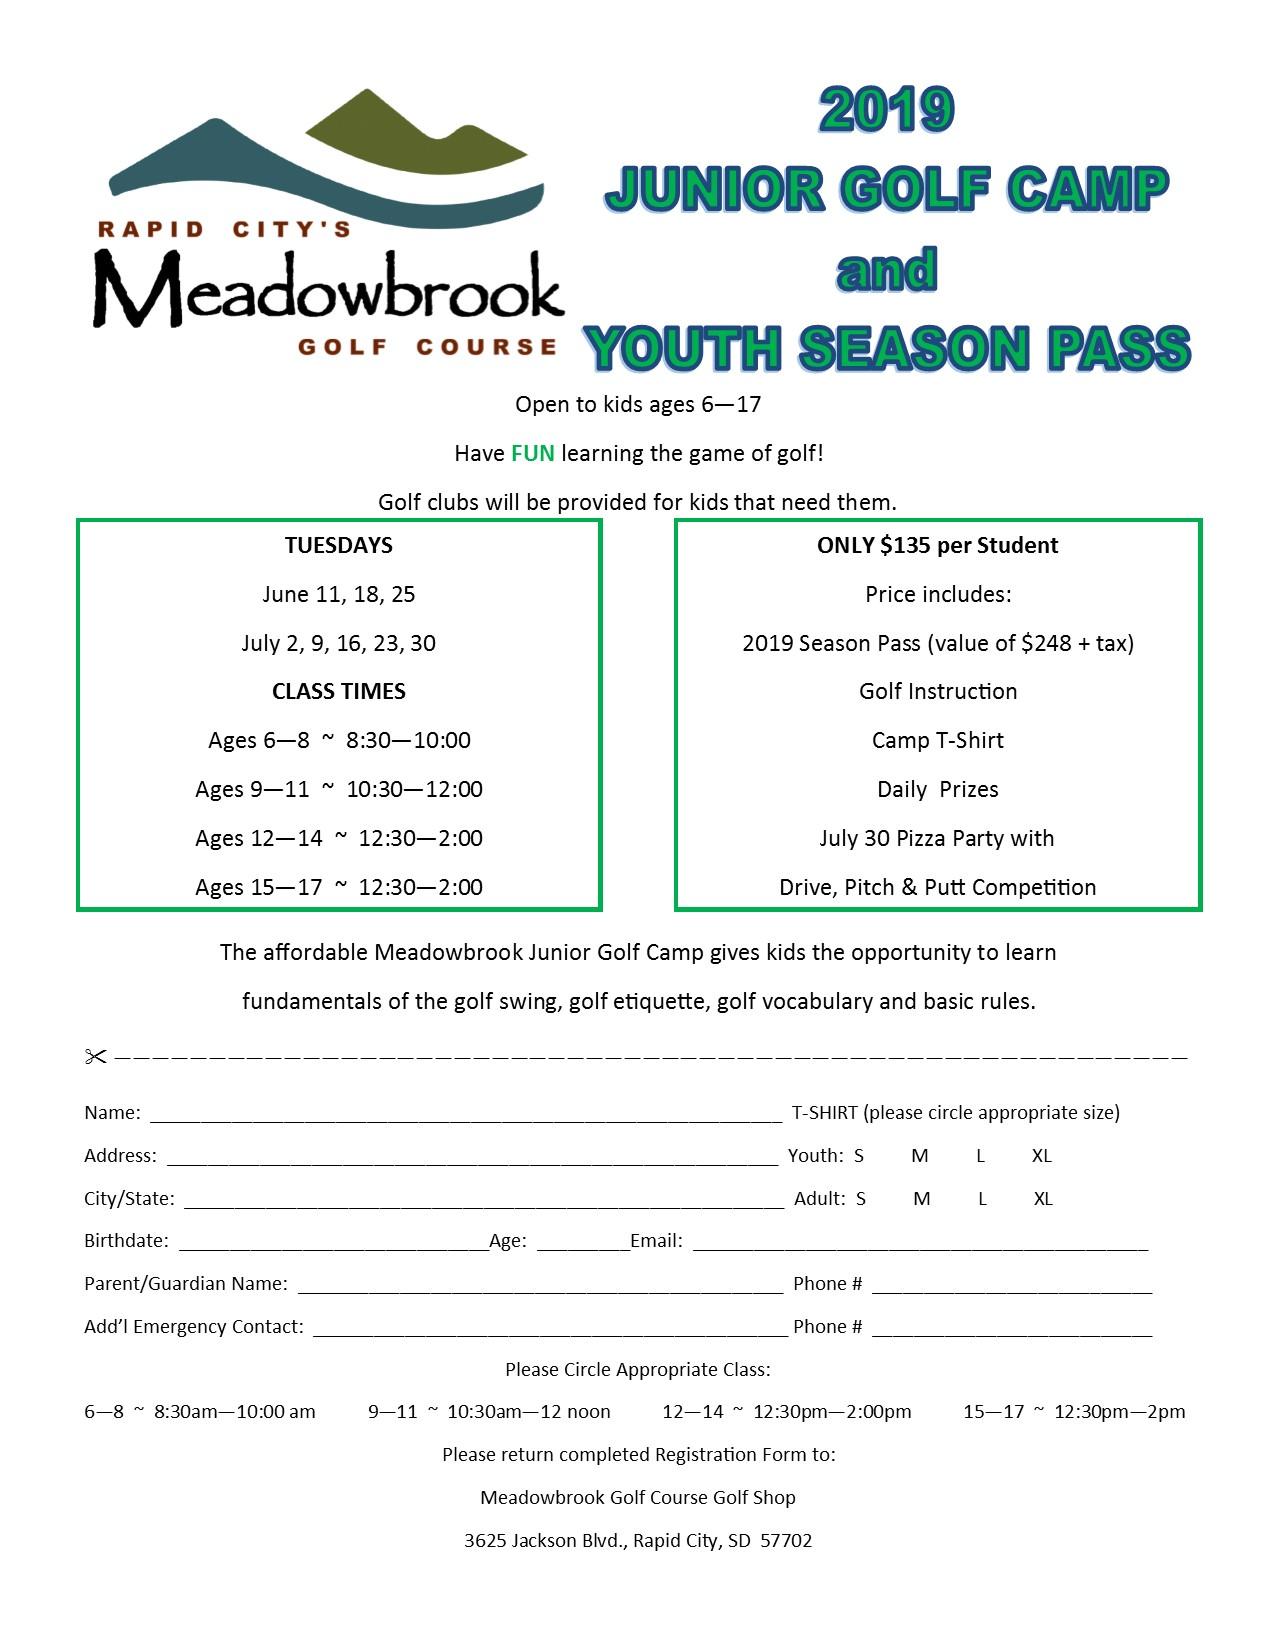 2019 Junior Golf Camp with dates pic